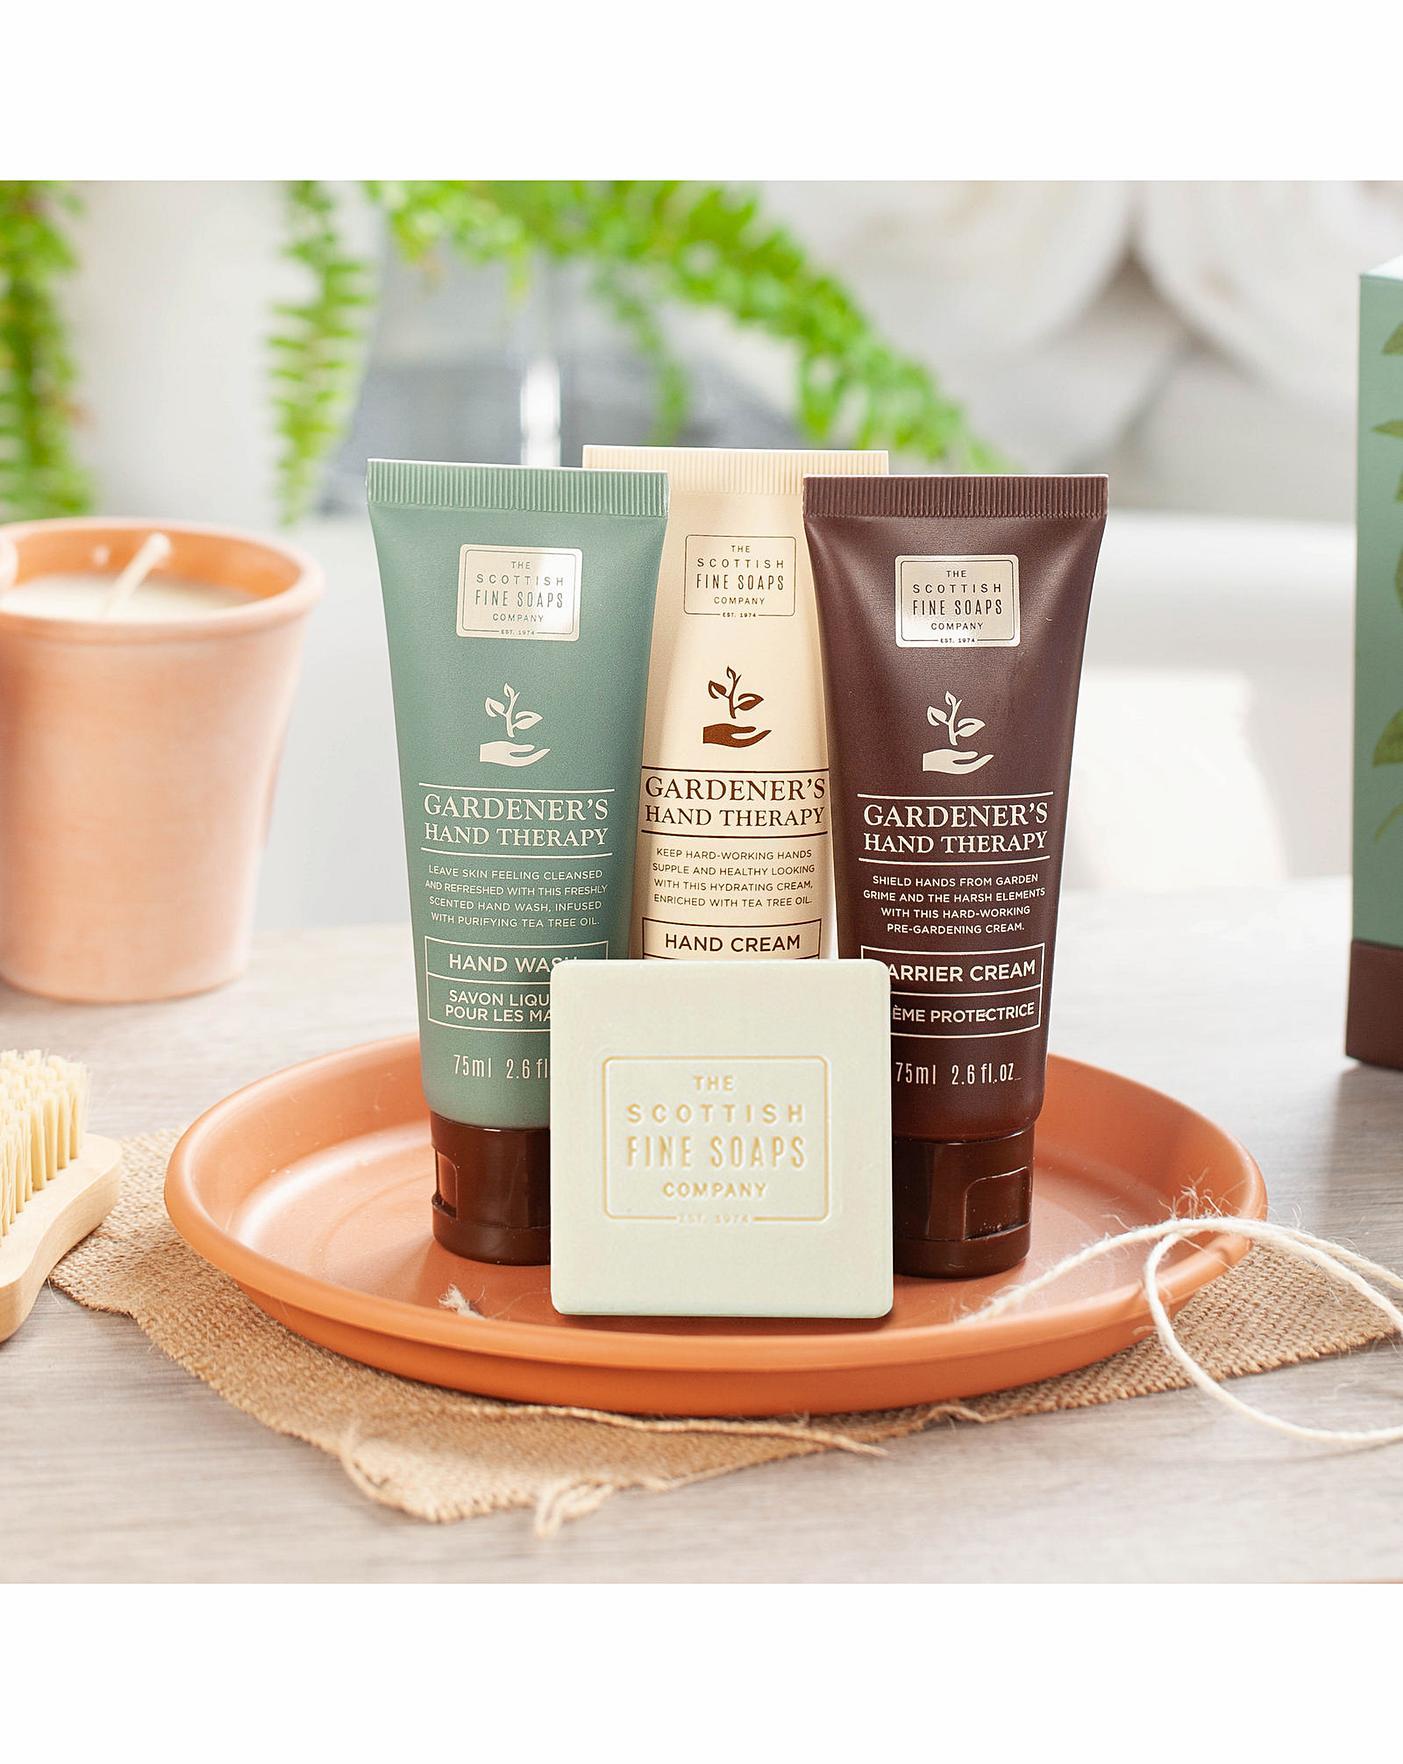 Hand Cream for Gardener's and Hard Working Hands